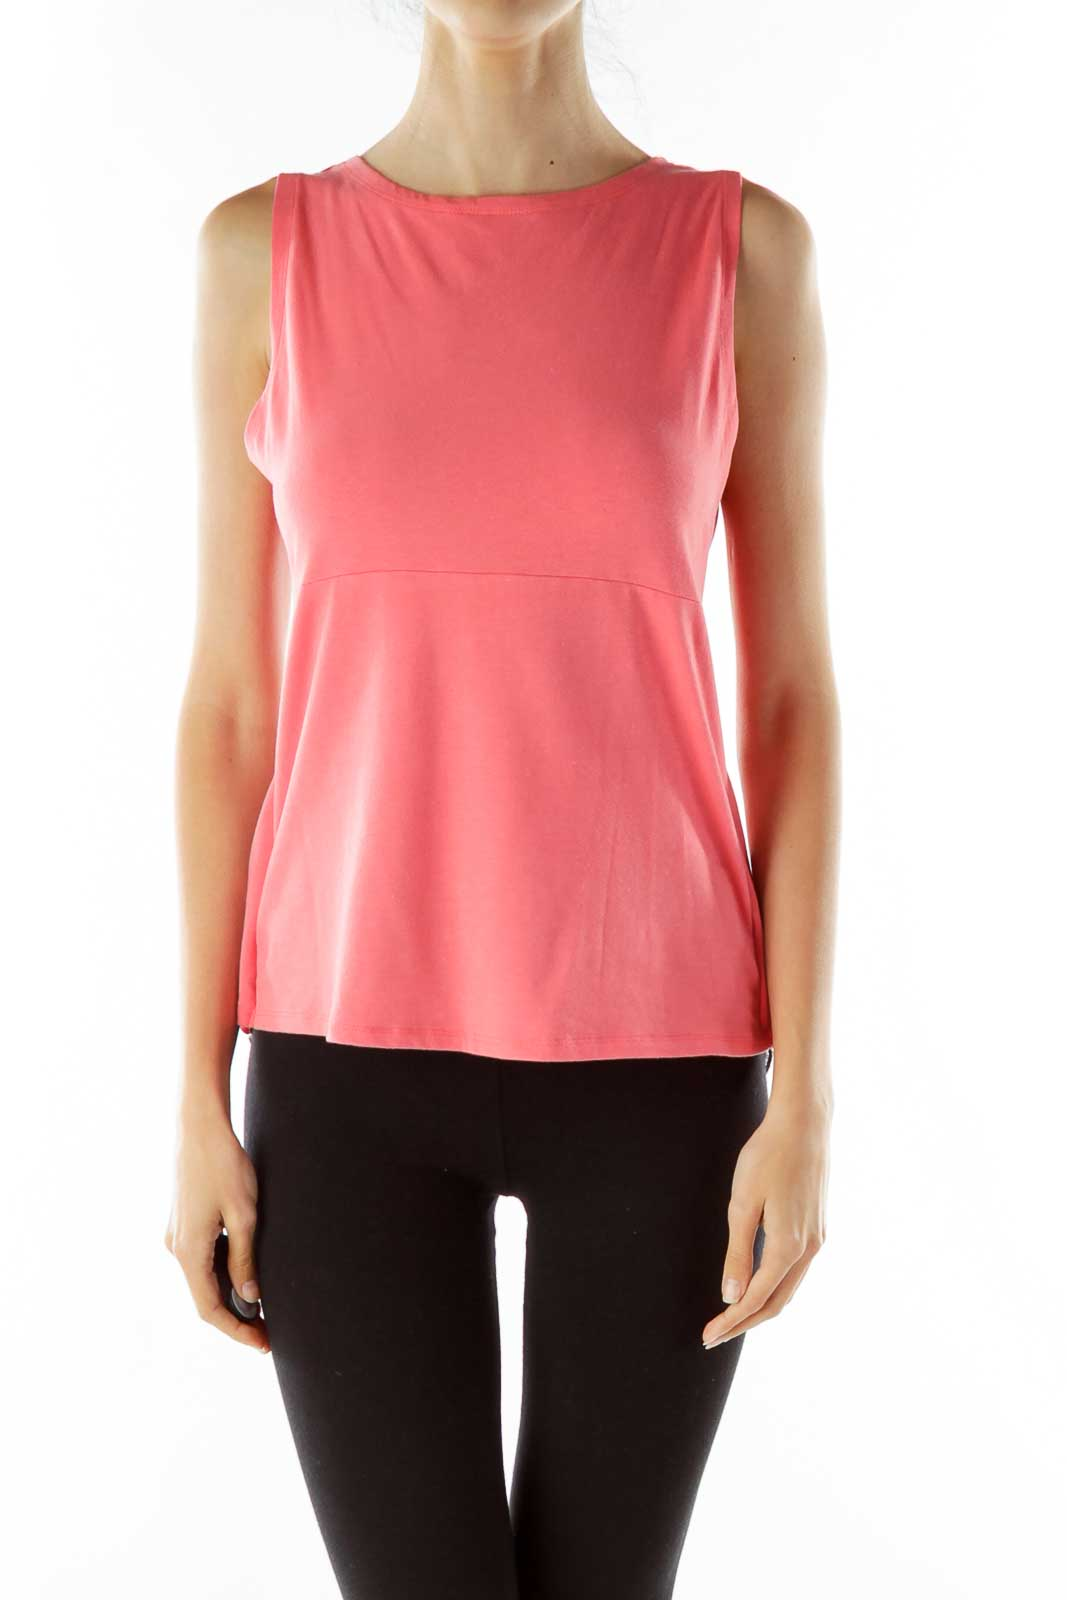 Pink Gray Sheer Top Front